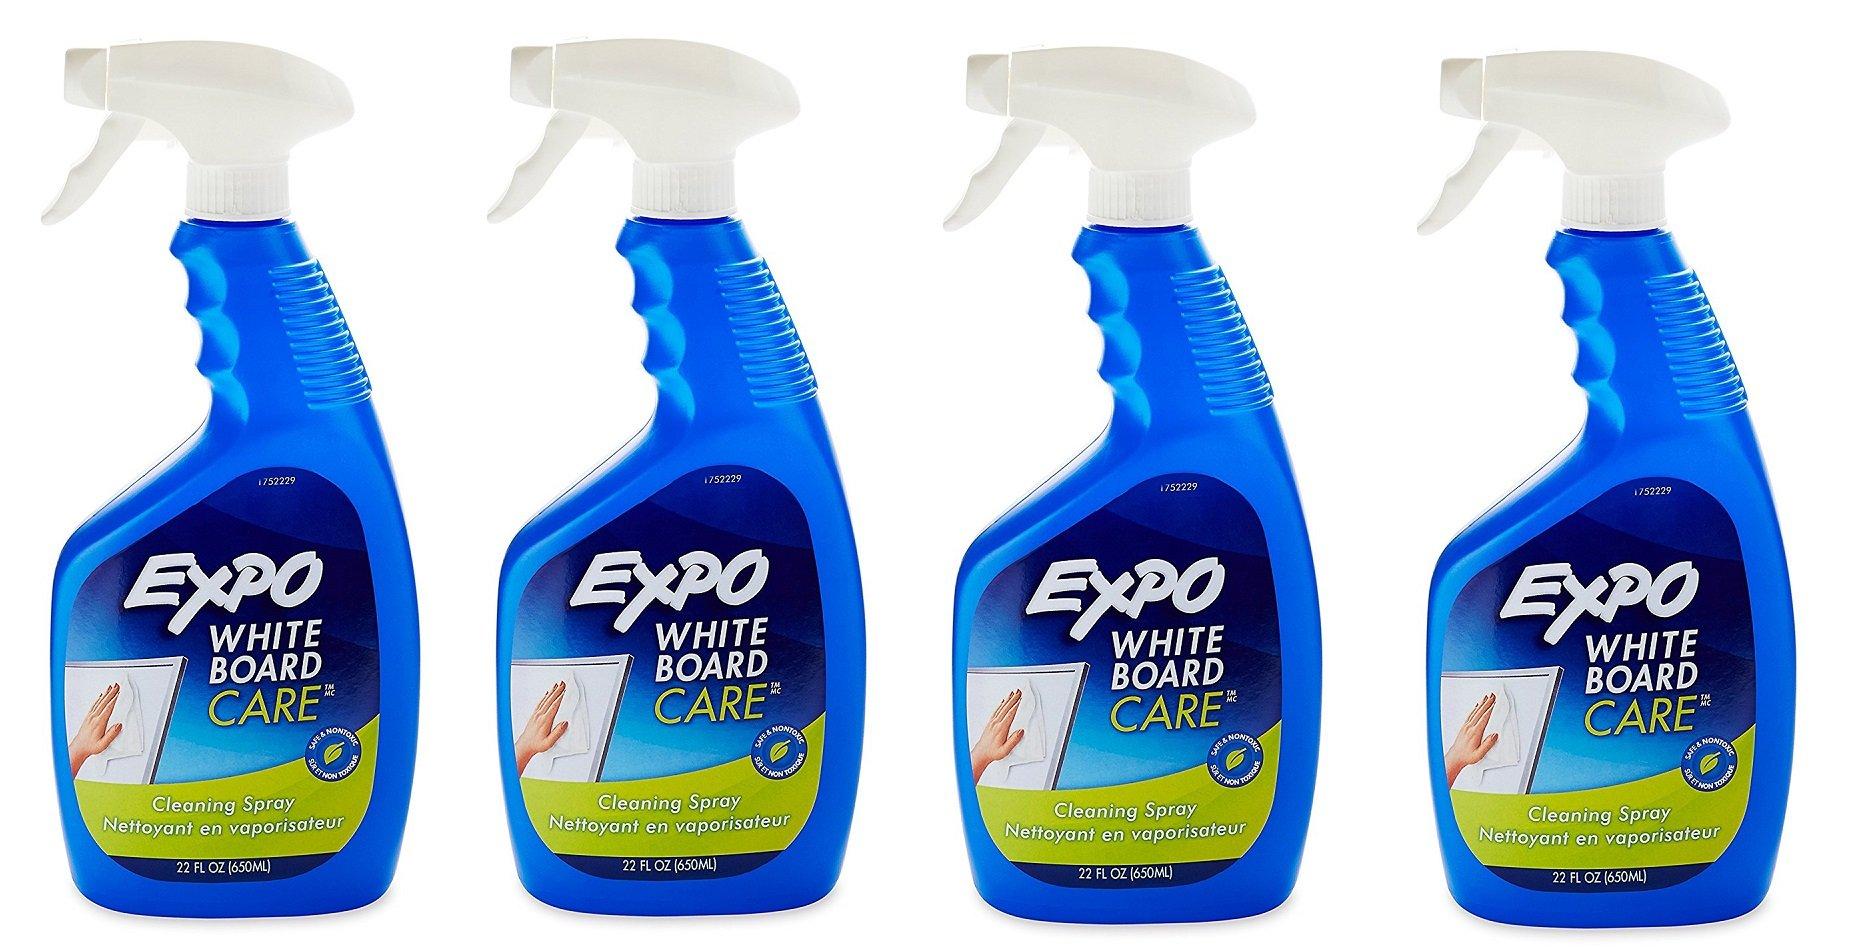 EXPO Whiteboard / Dry Erase Board Liquid Cleaner NqKPcH, 22, Oz (4 Bottles)